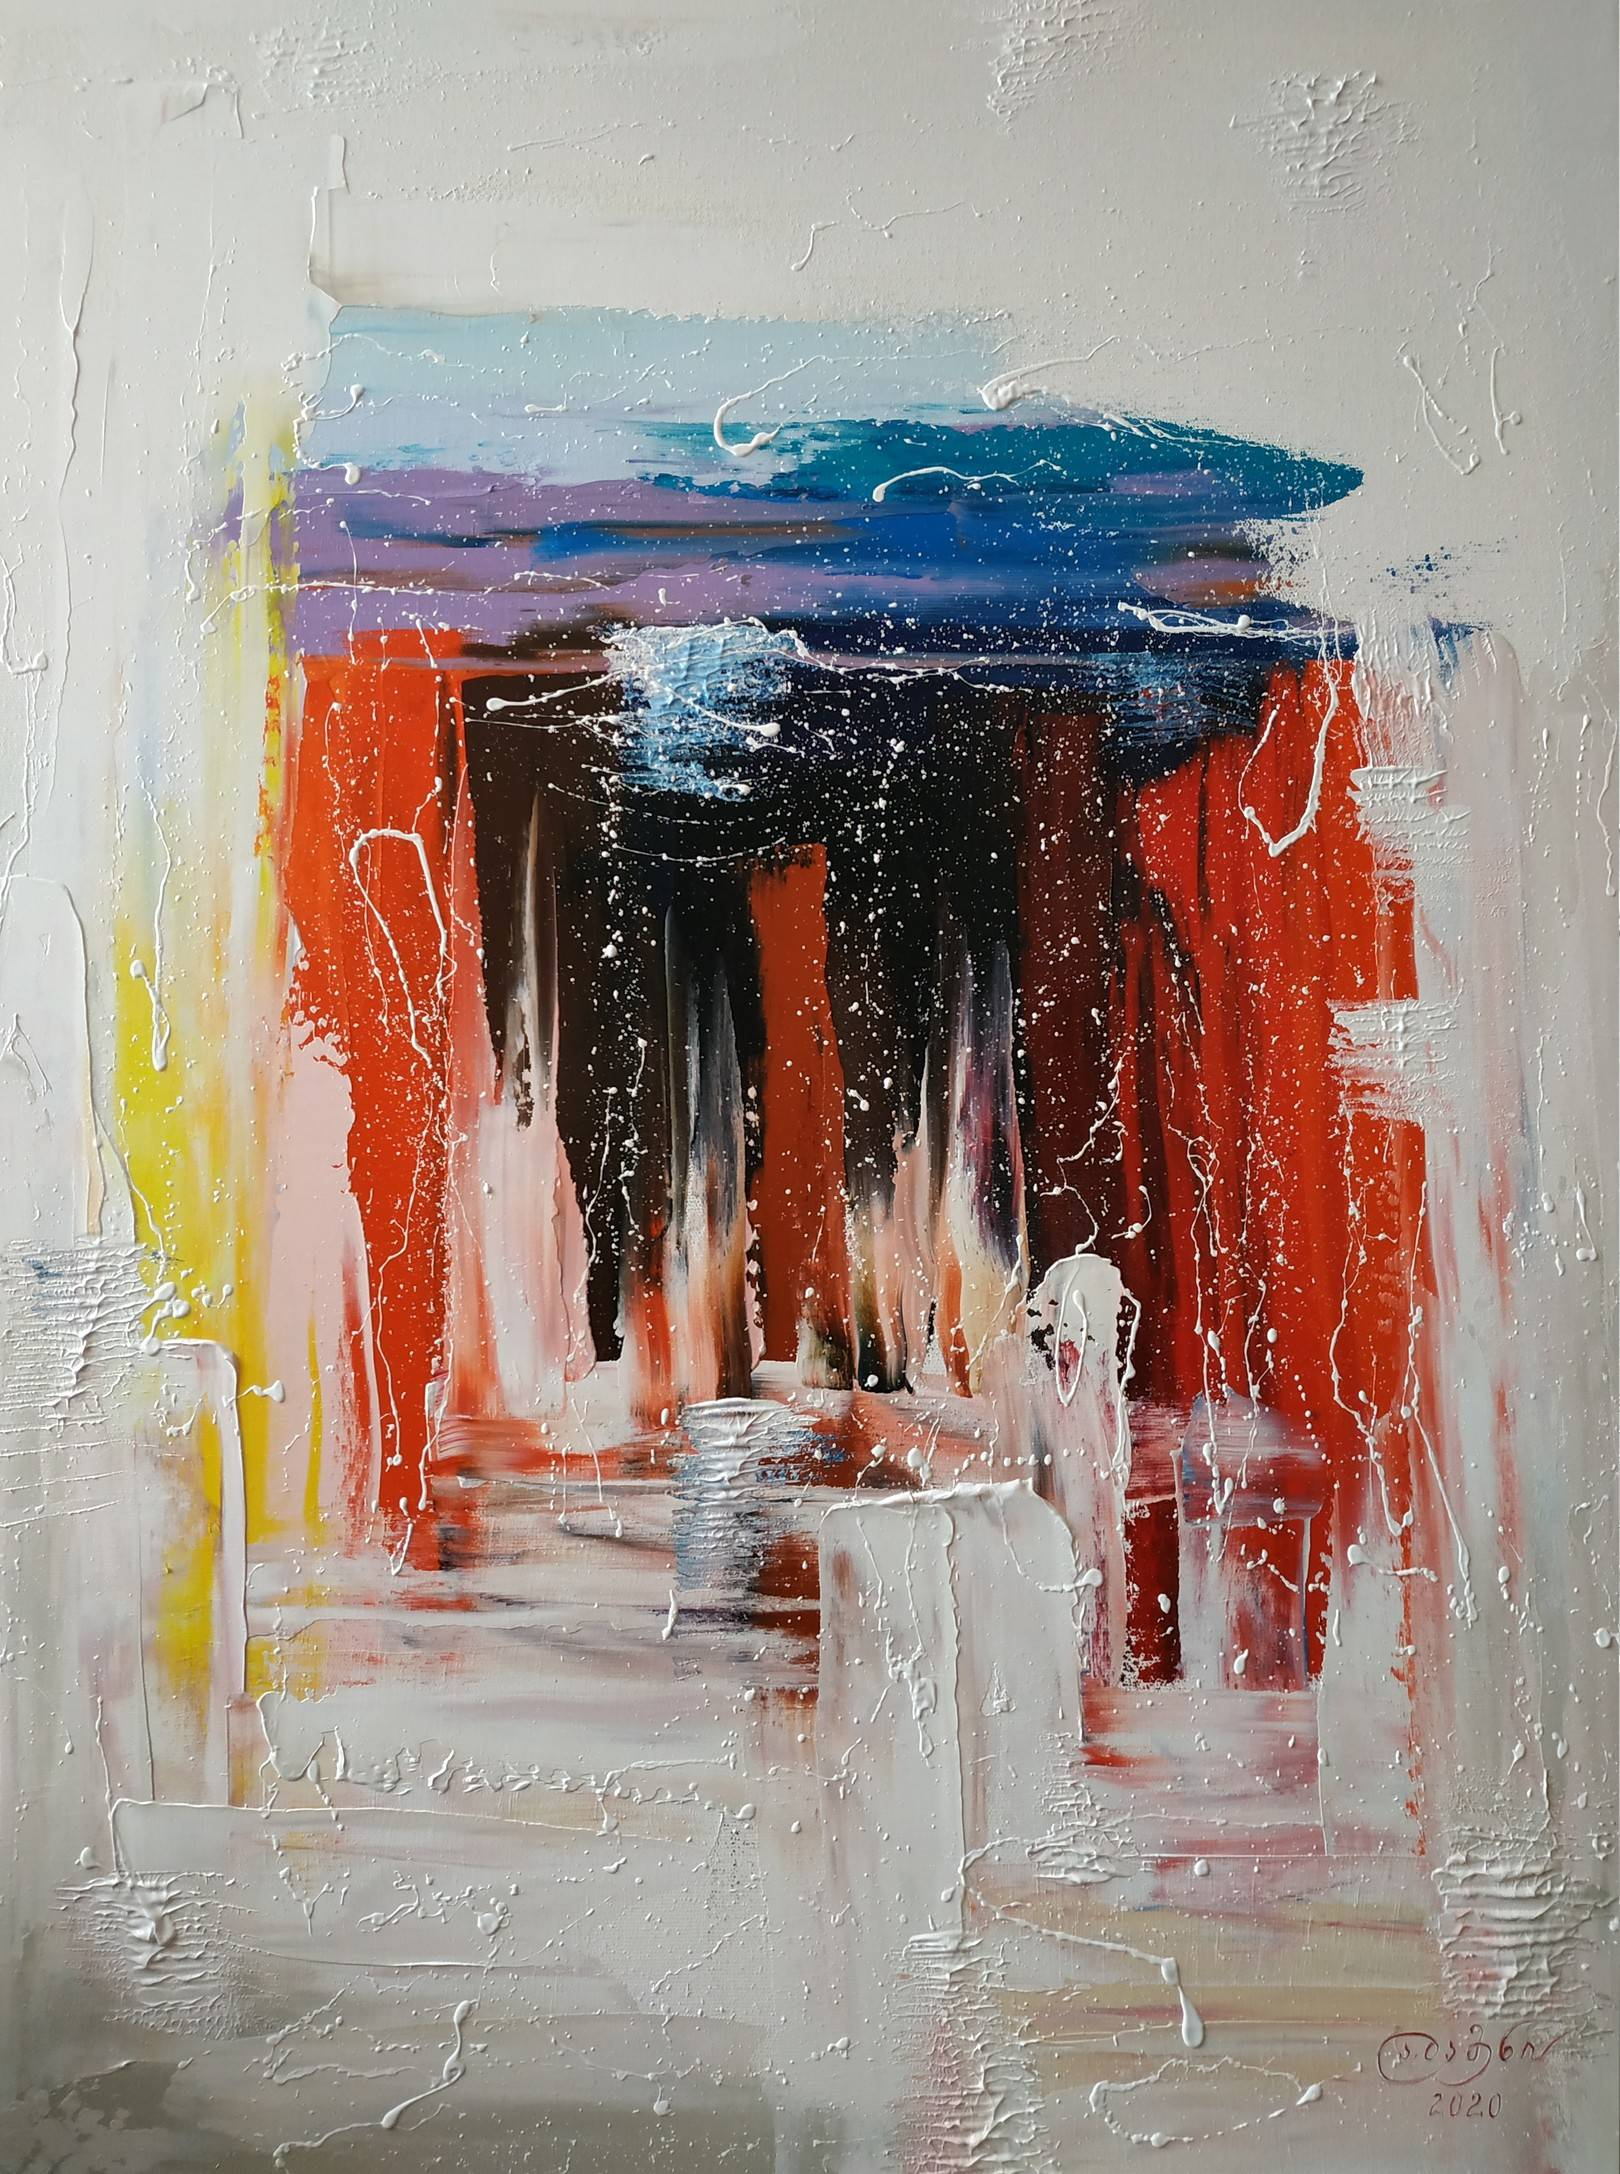 «Портал»       холст, масло «Portal»  oil on canvas                                                      90x70,  2020